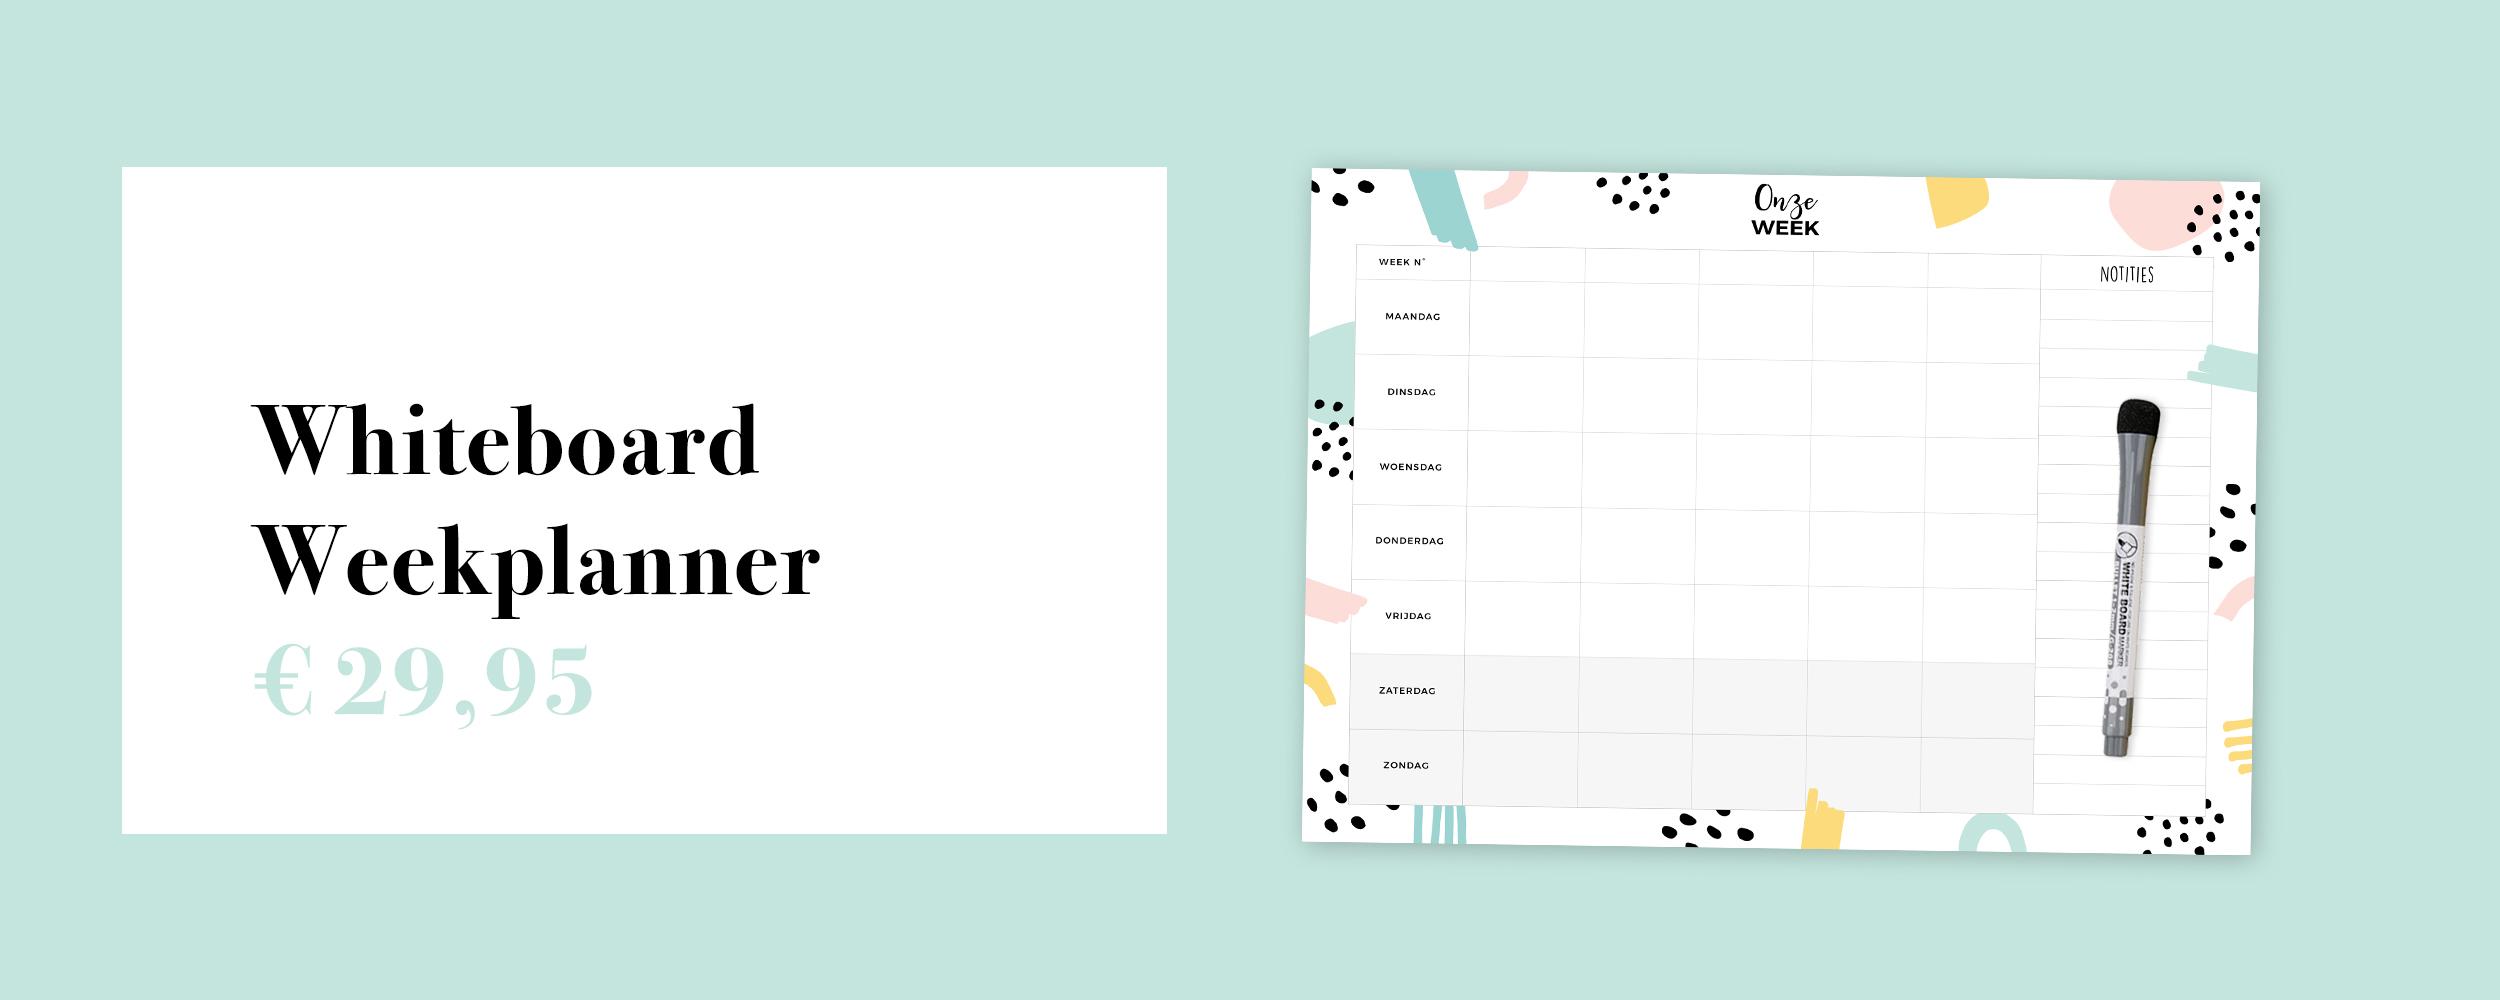 whiteboard weekplanner familieplanner